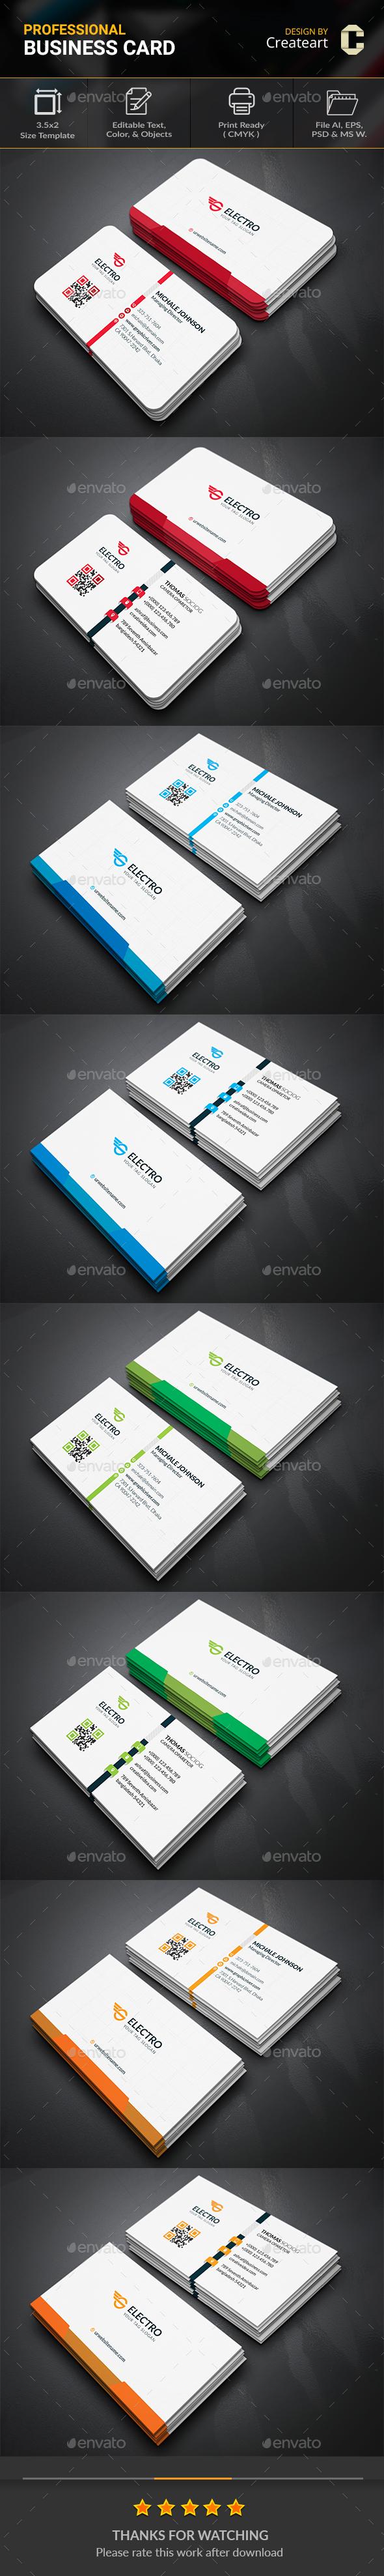 GraphicRiver Business Card Bundle 20496180